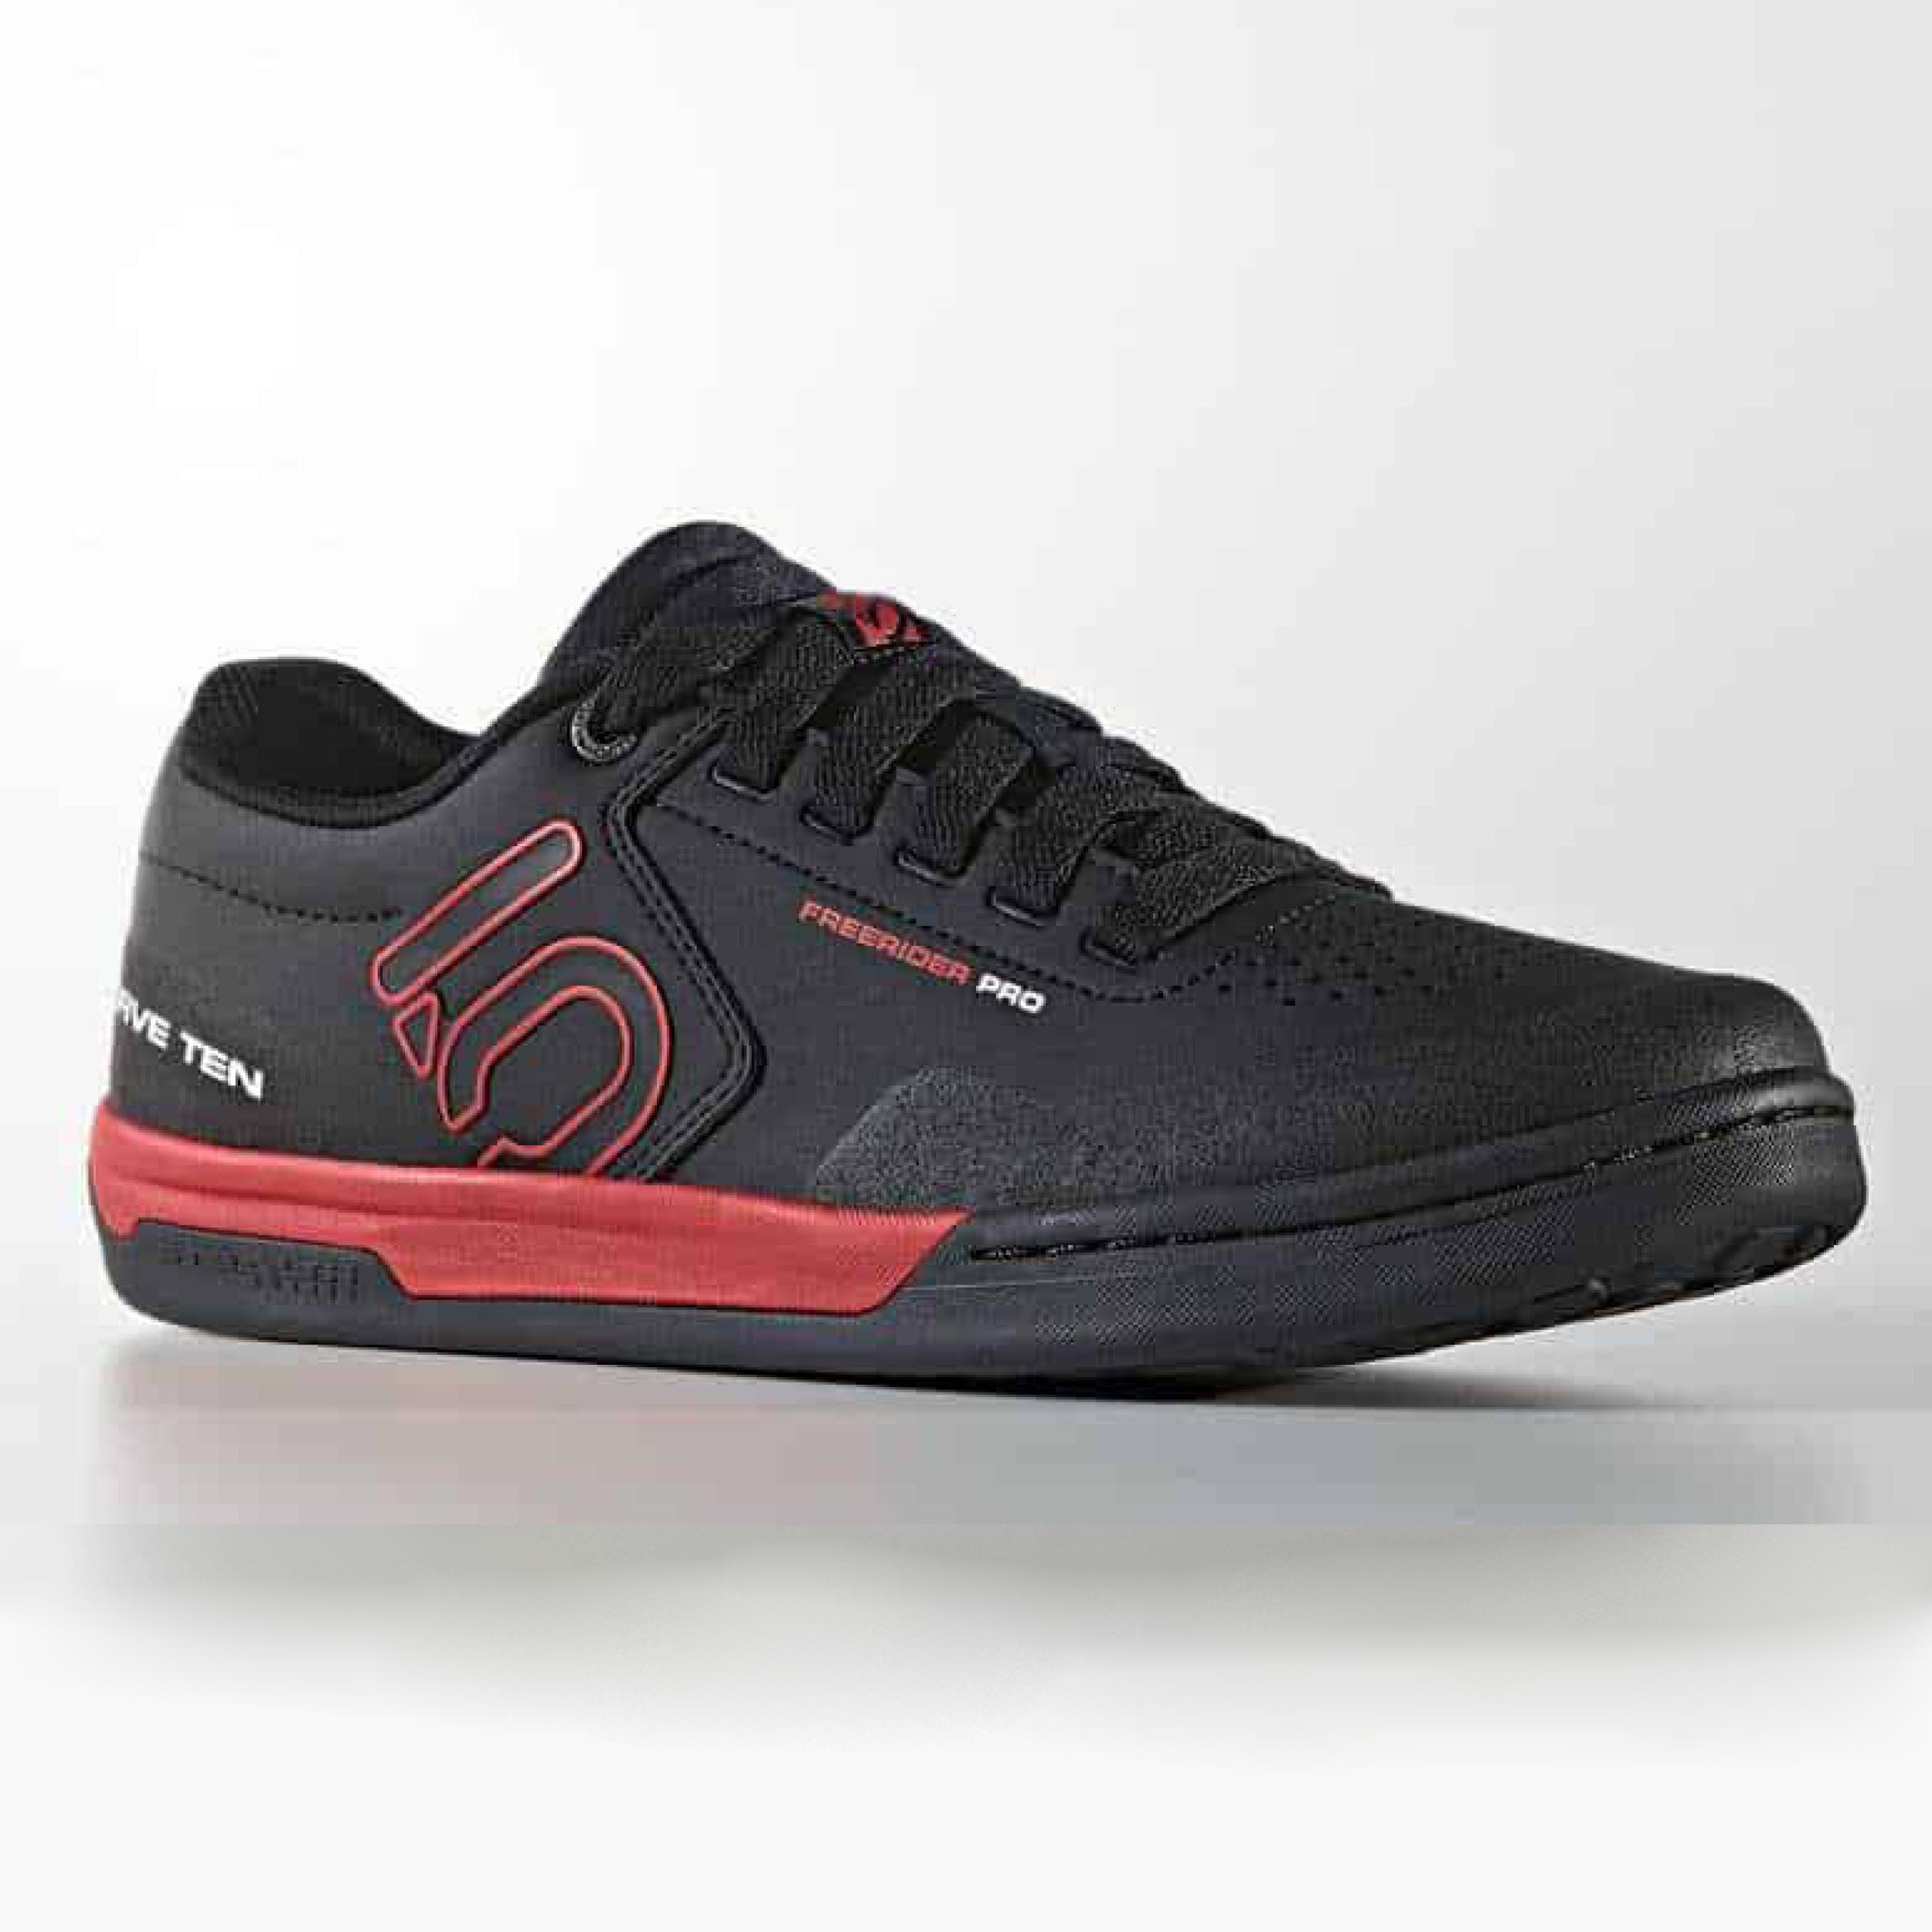 Five Ten Freerider Pro MTB Shoes Black/Red